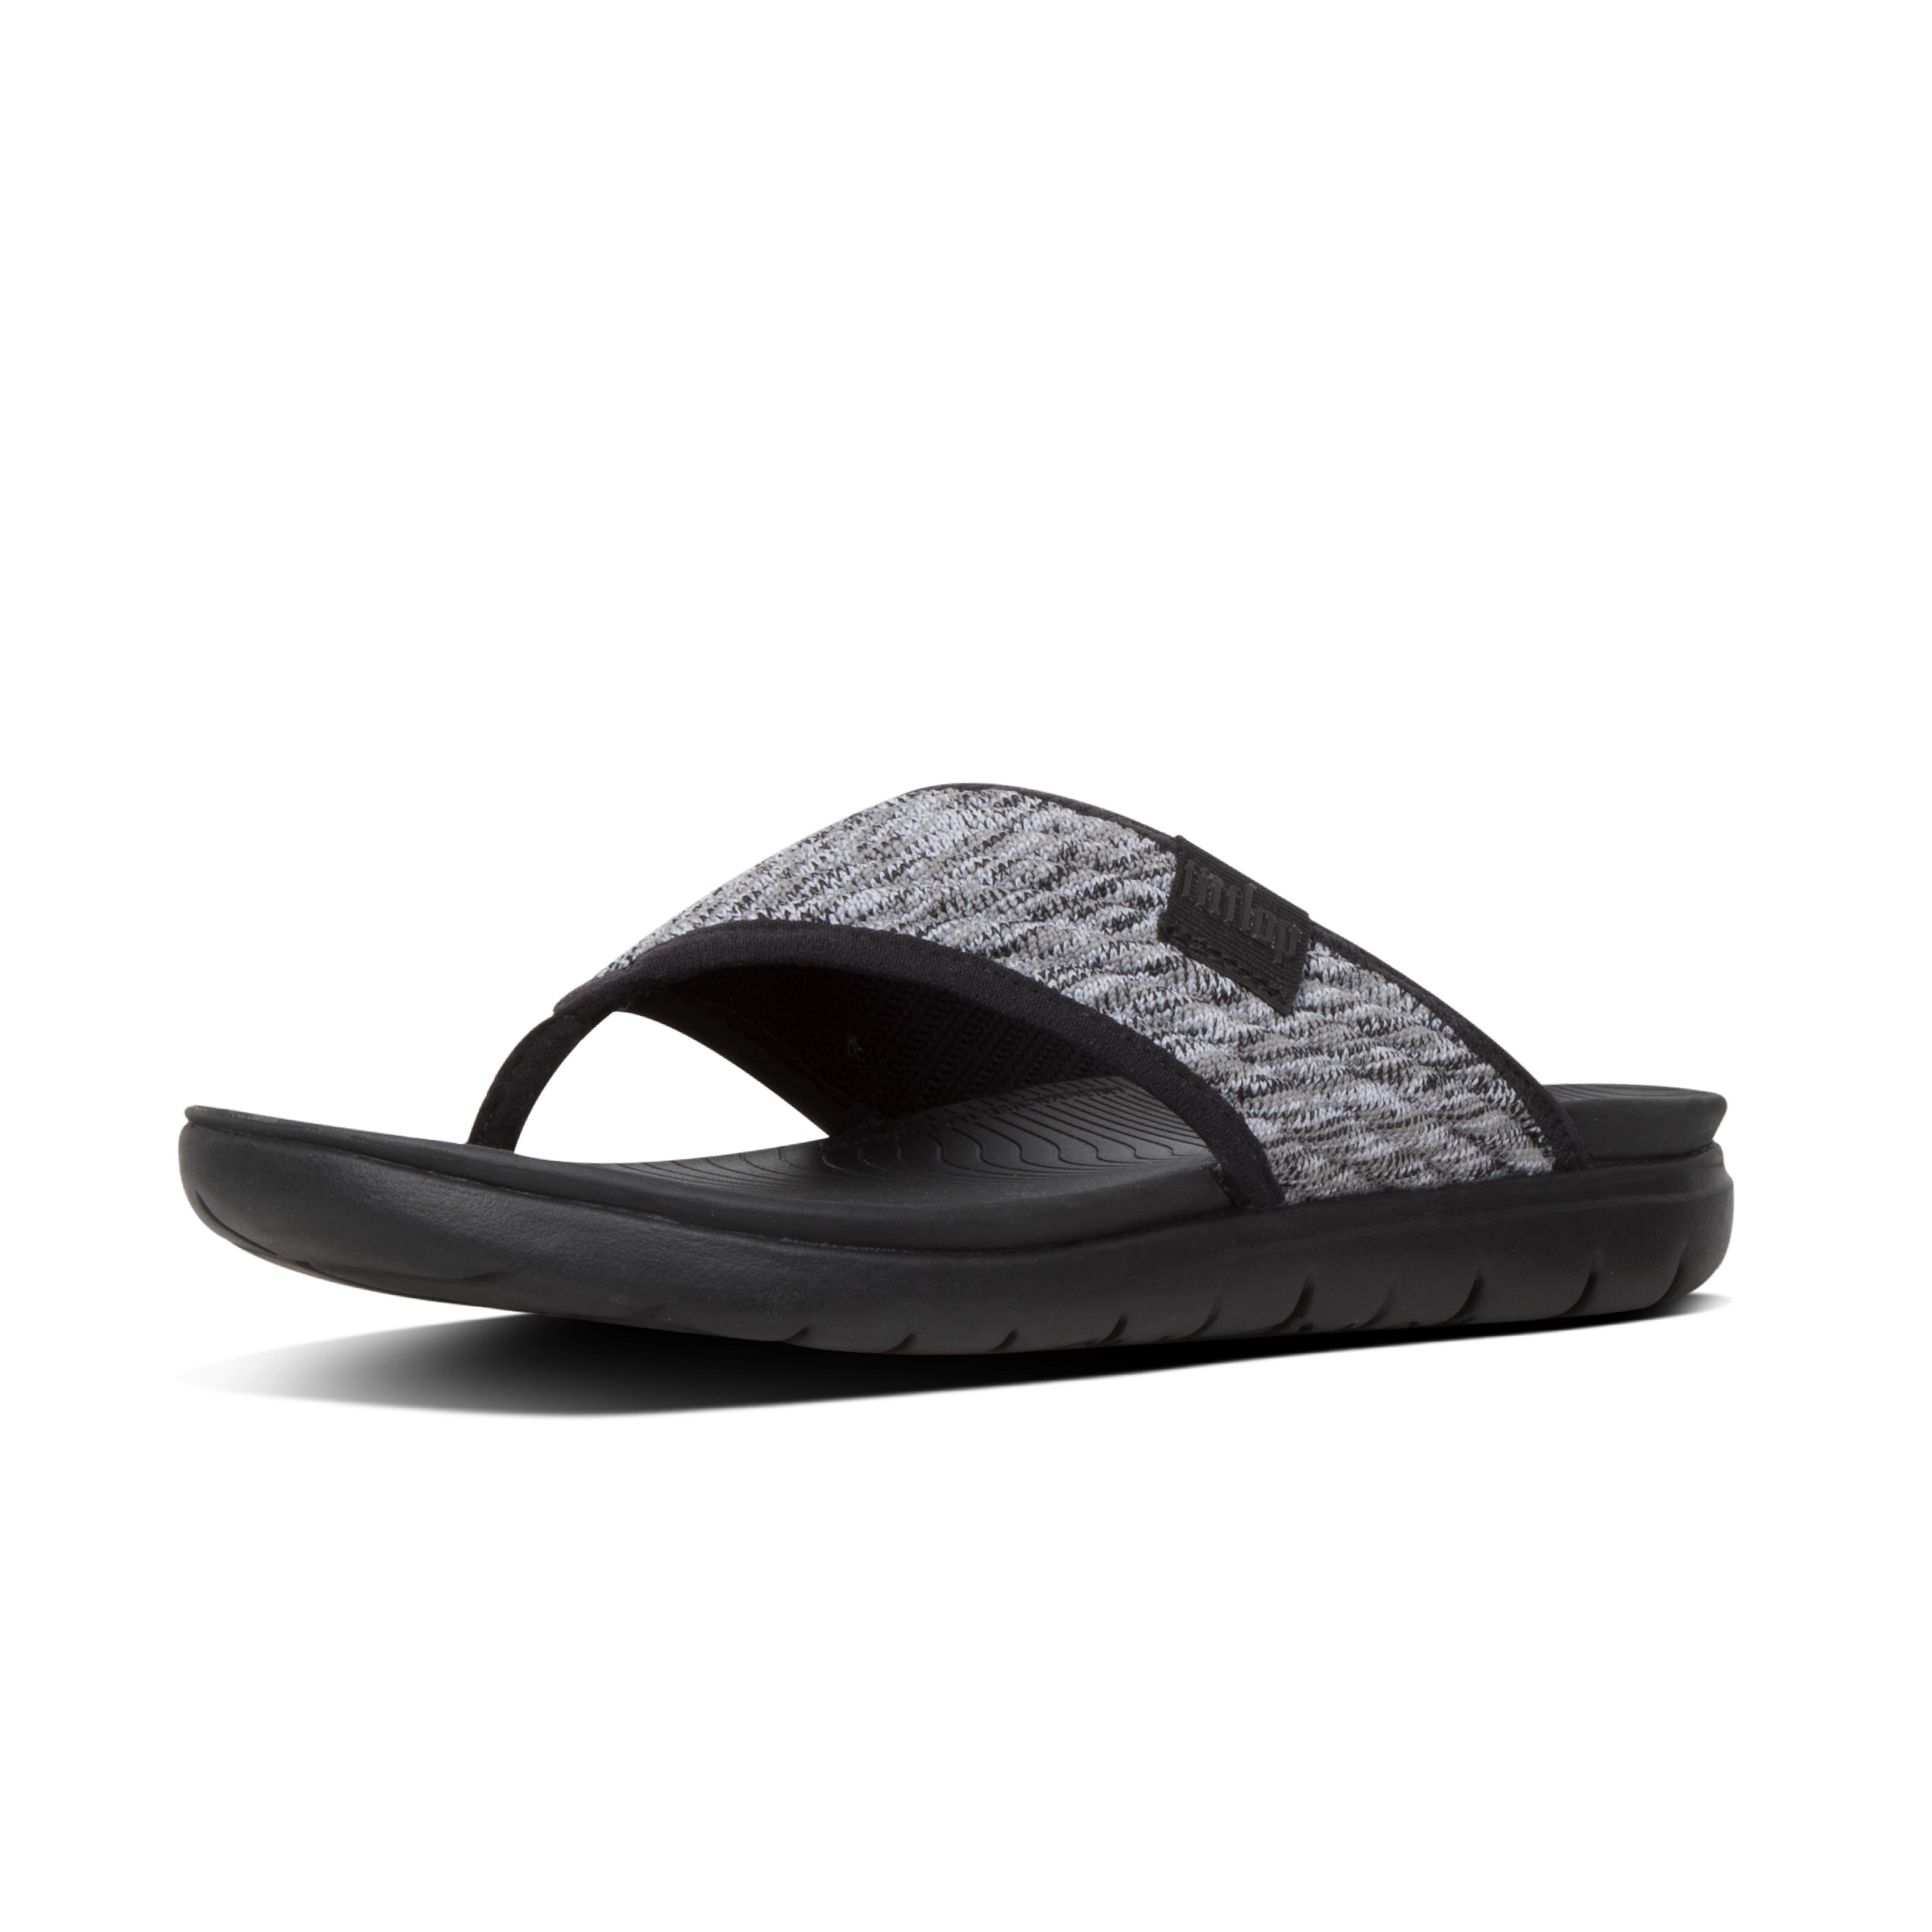 Artknit toe post black mix q87 231?v=3